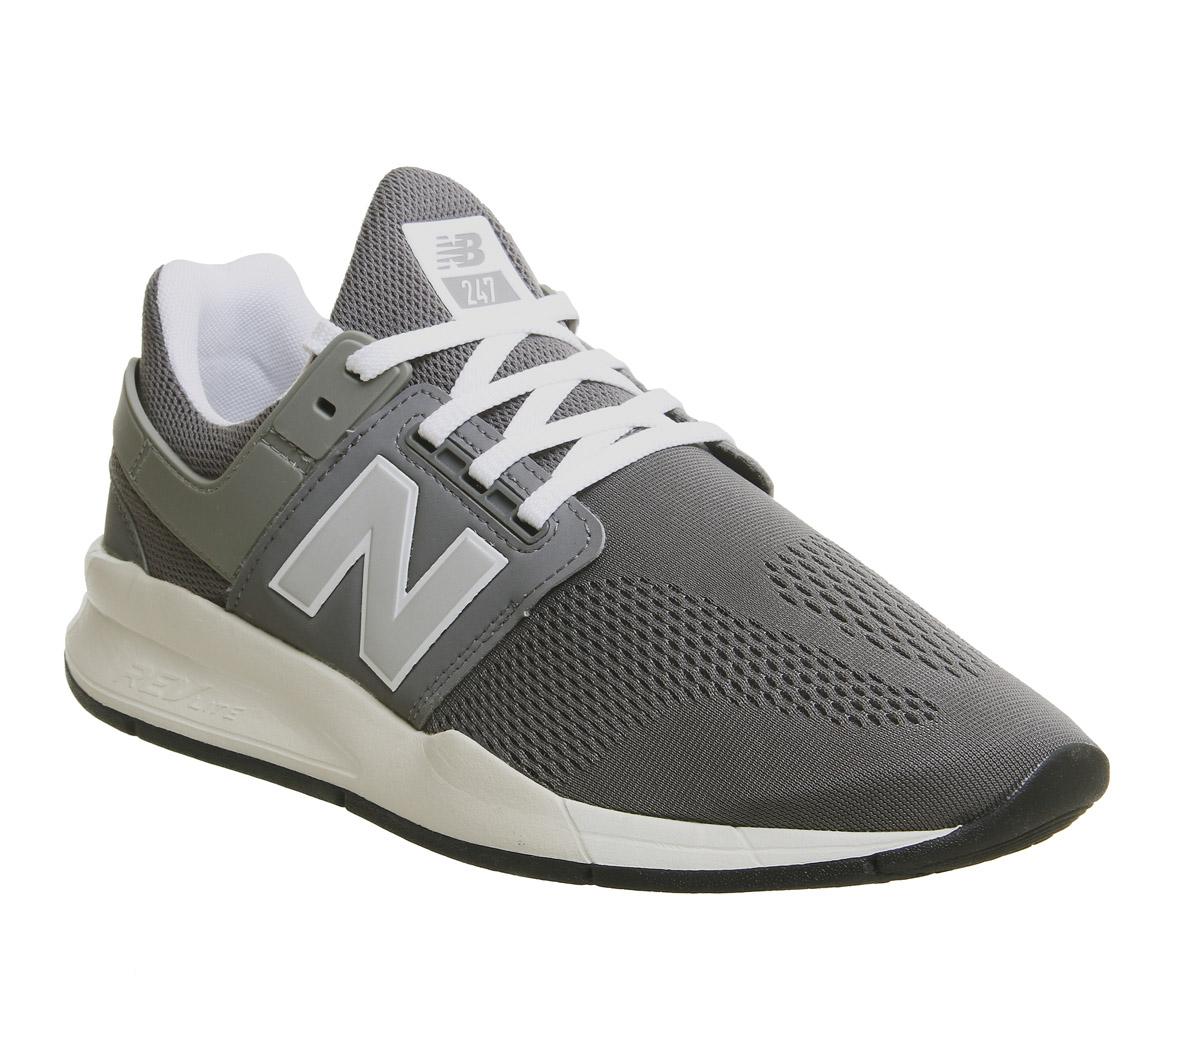 new arrival bb2c0 0291d Sentinel New Balance 247V2 Trainers Castlerock Bone Trainers Shoes